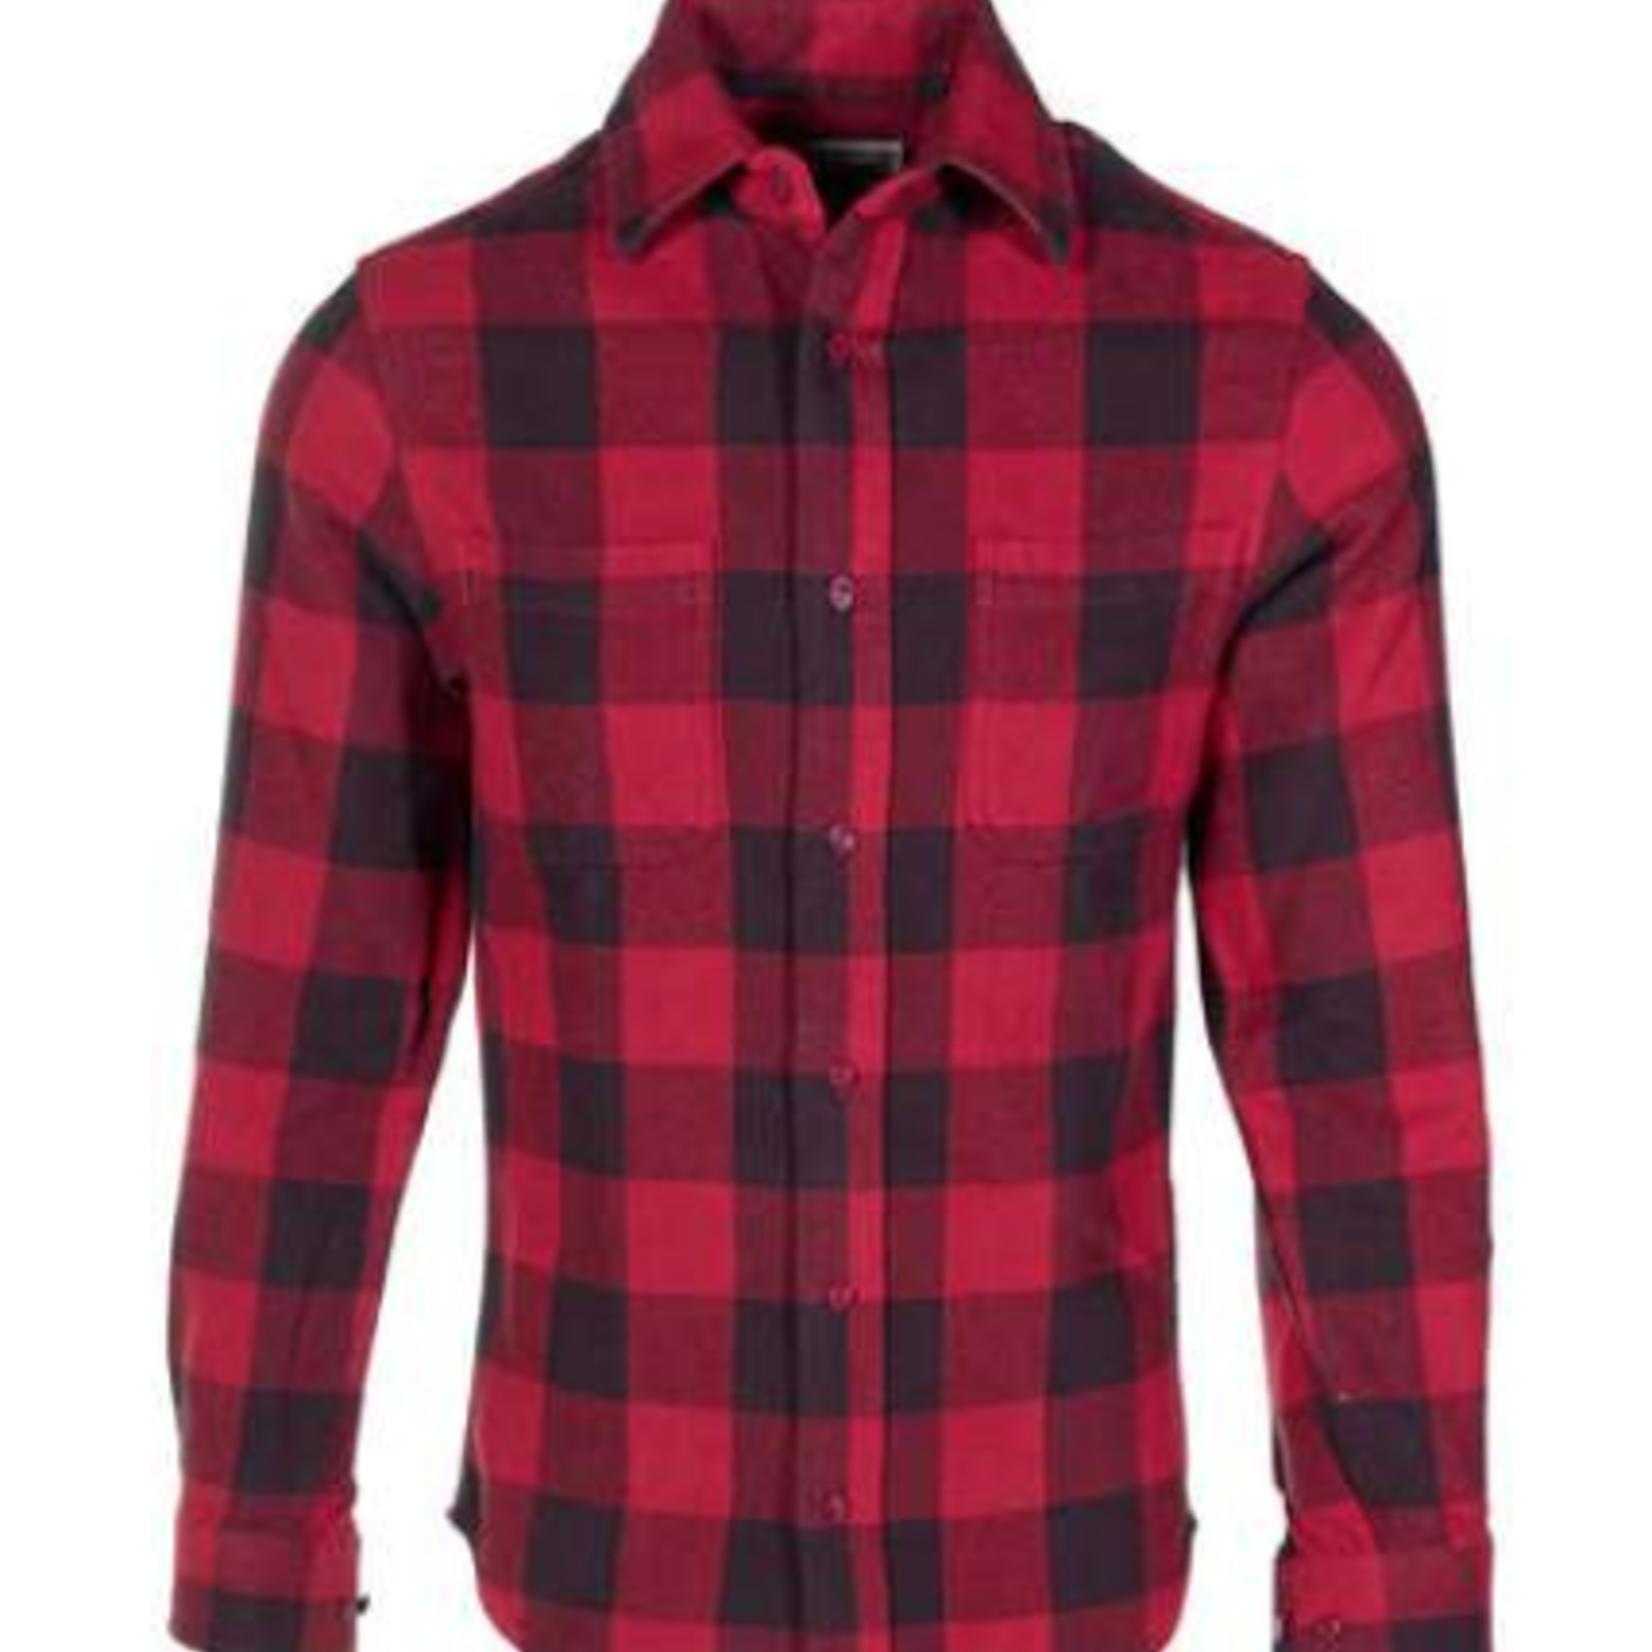 Schott Schott Plaid Cotton Flannel Shirt